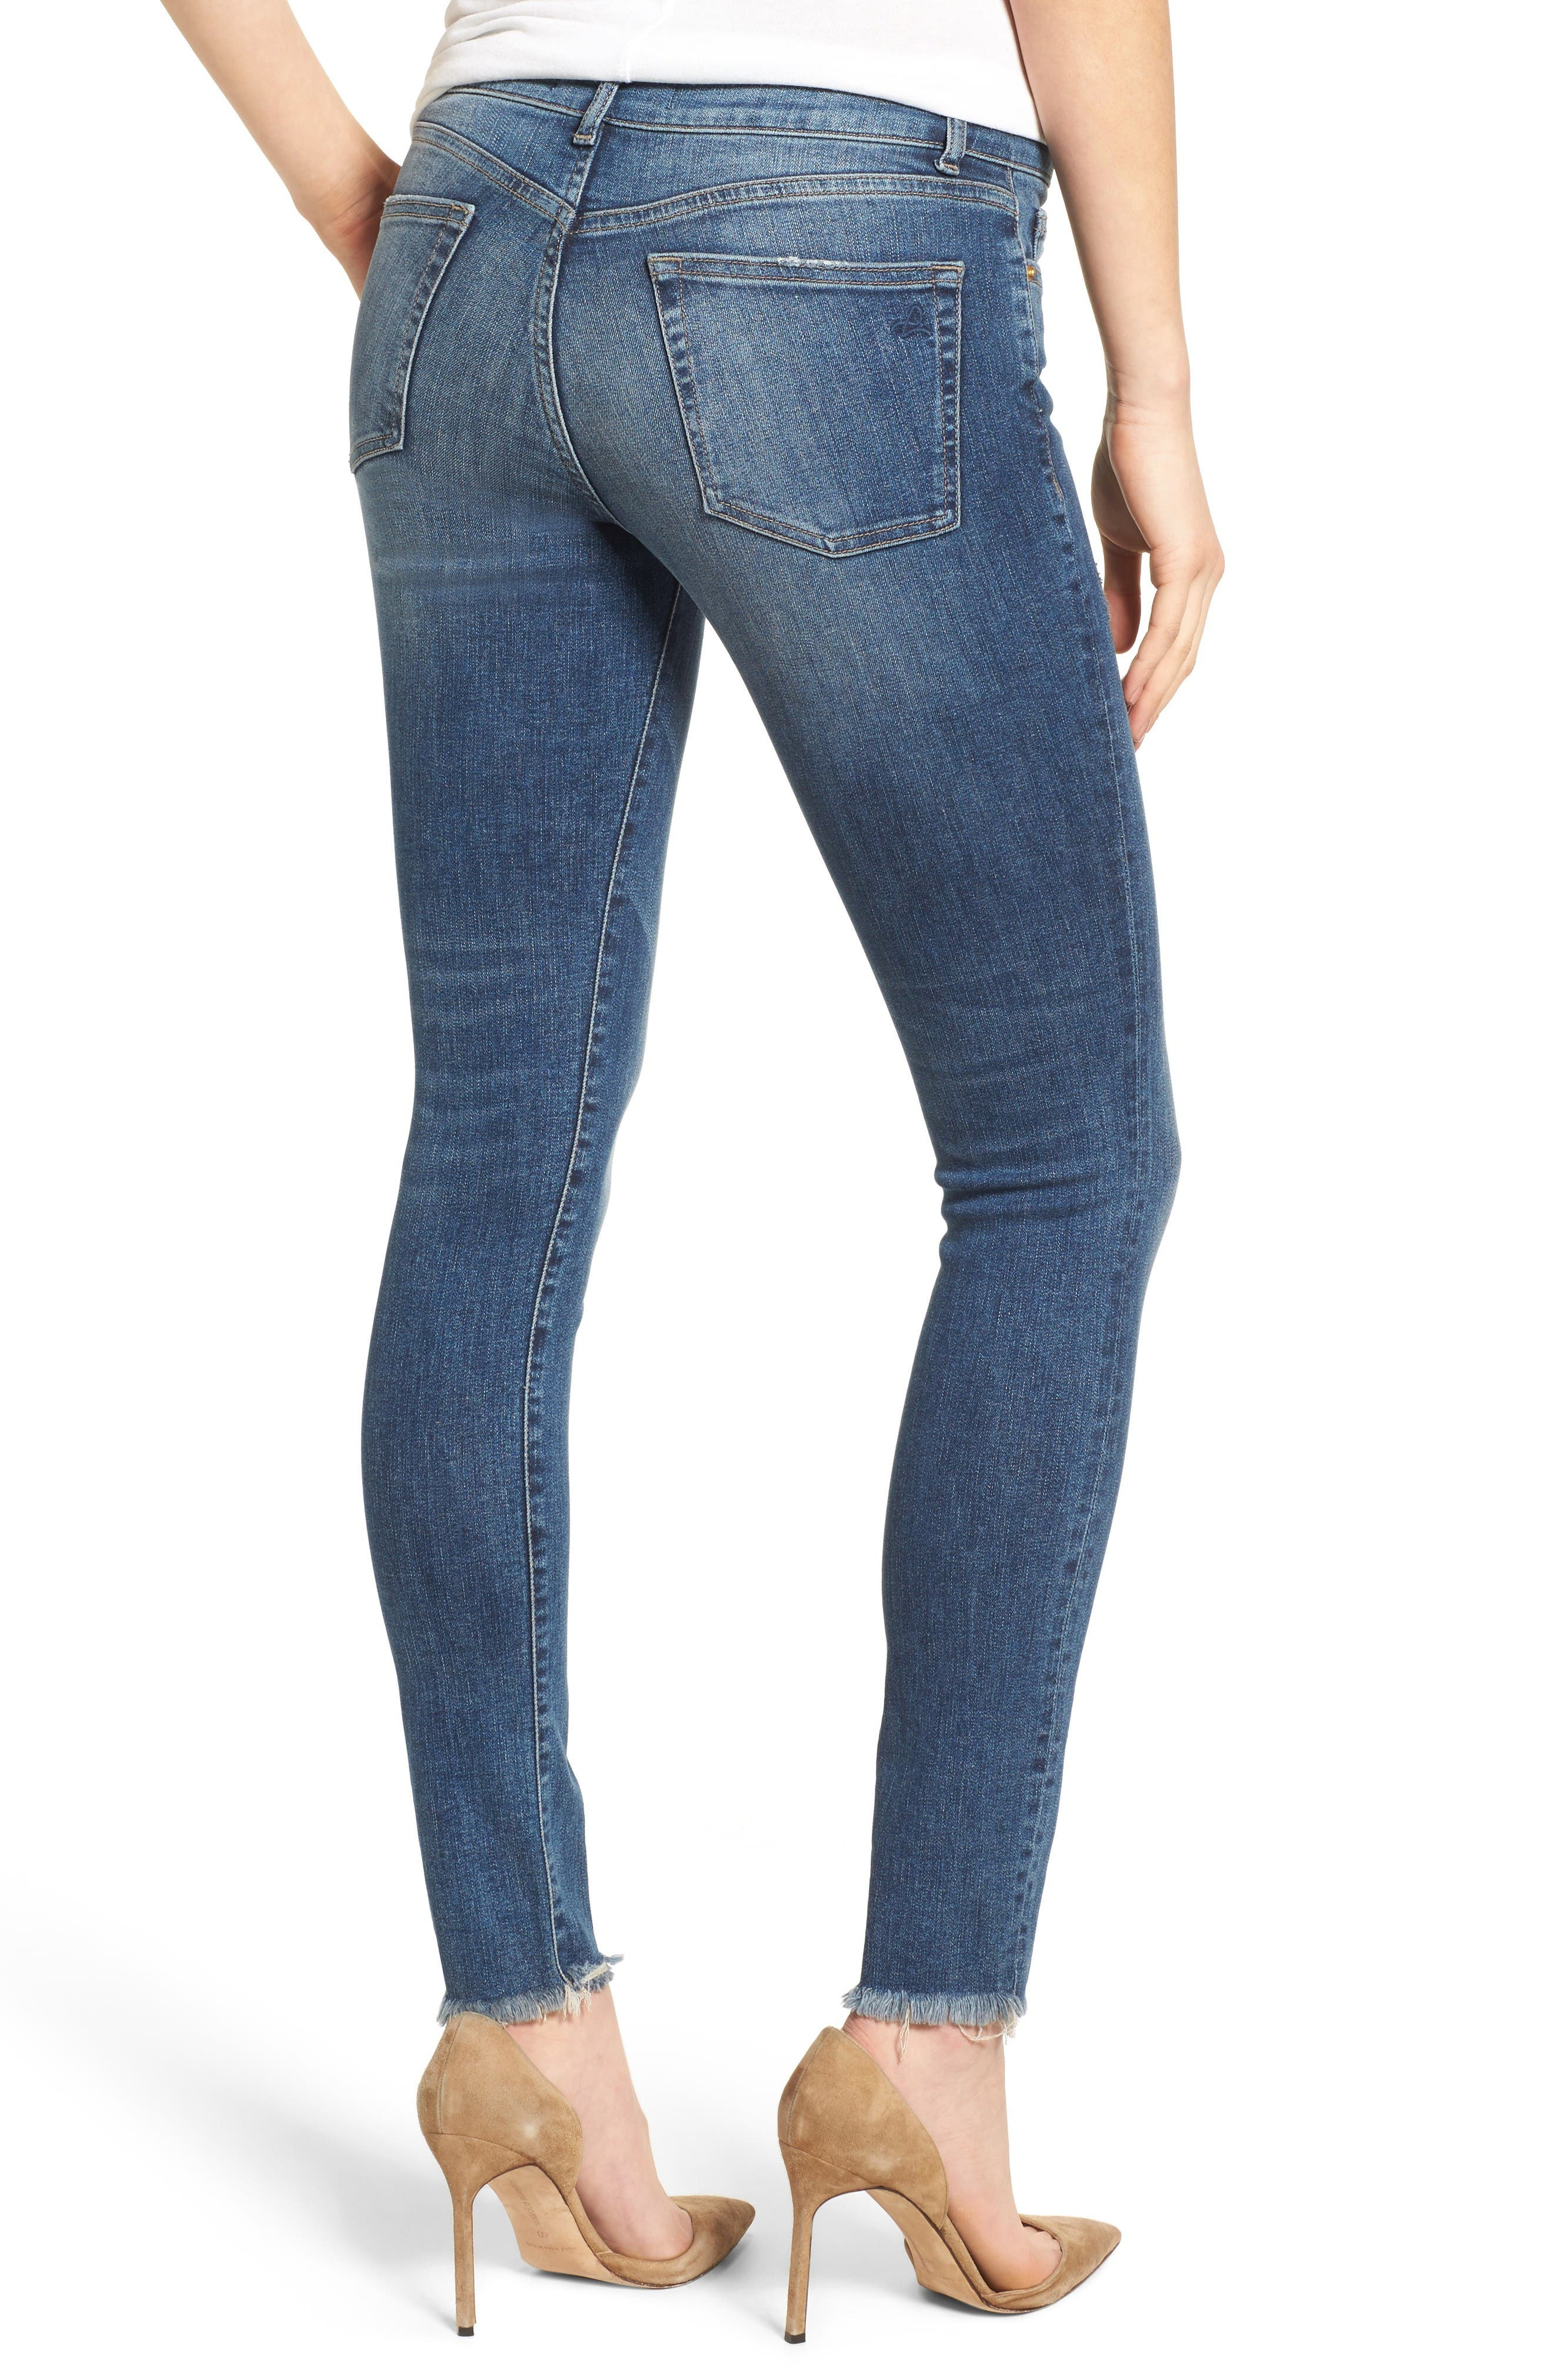 Alternate Image 2  - DL1961 Florence Instasculpt Skinny Jeans (Wicked)